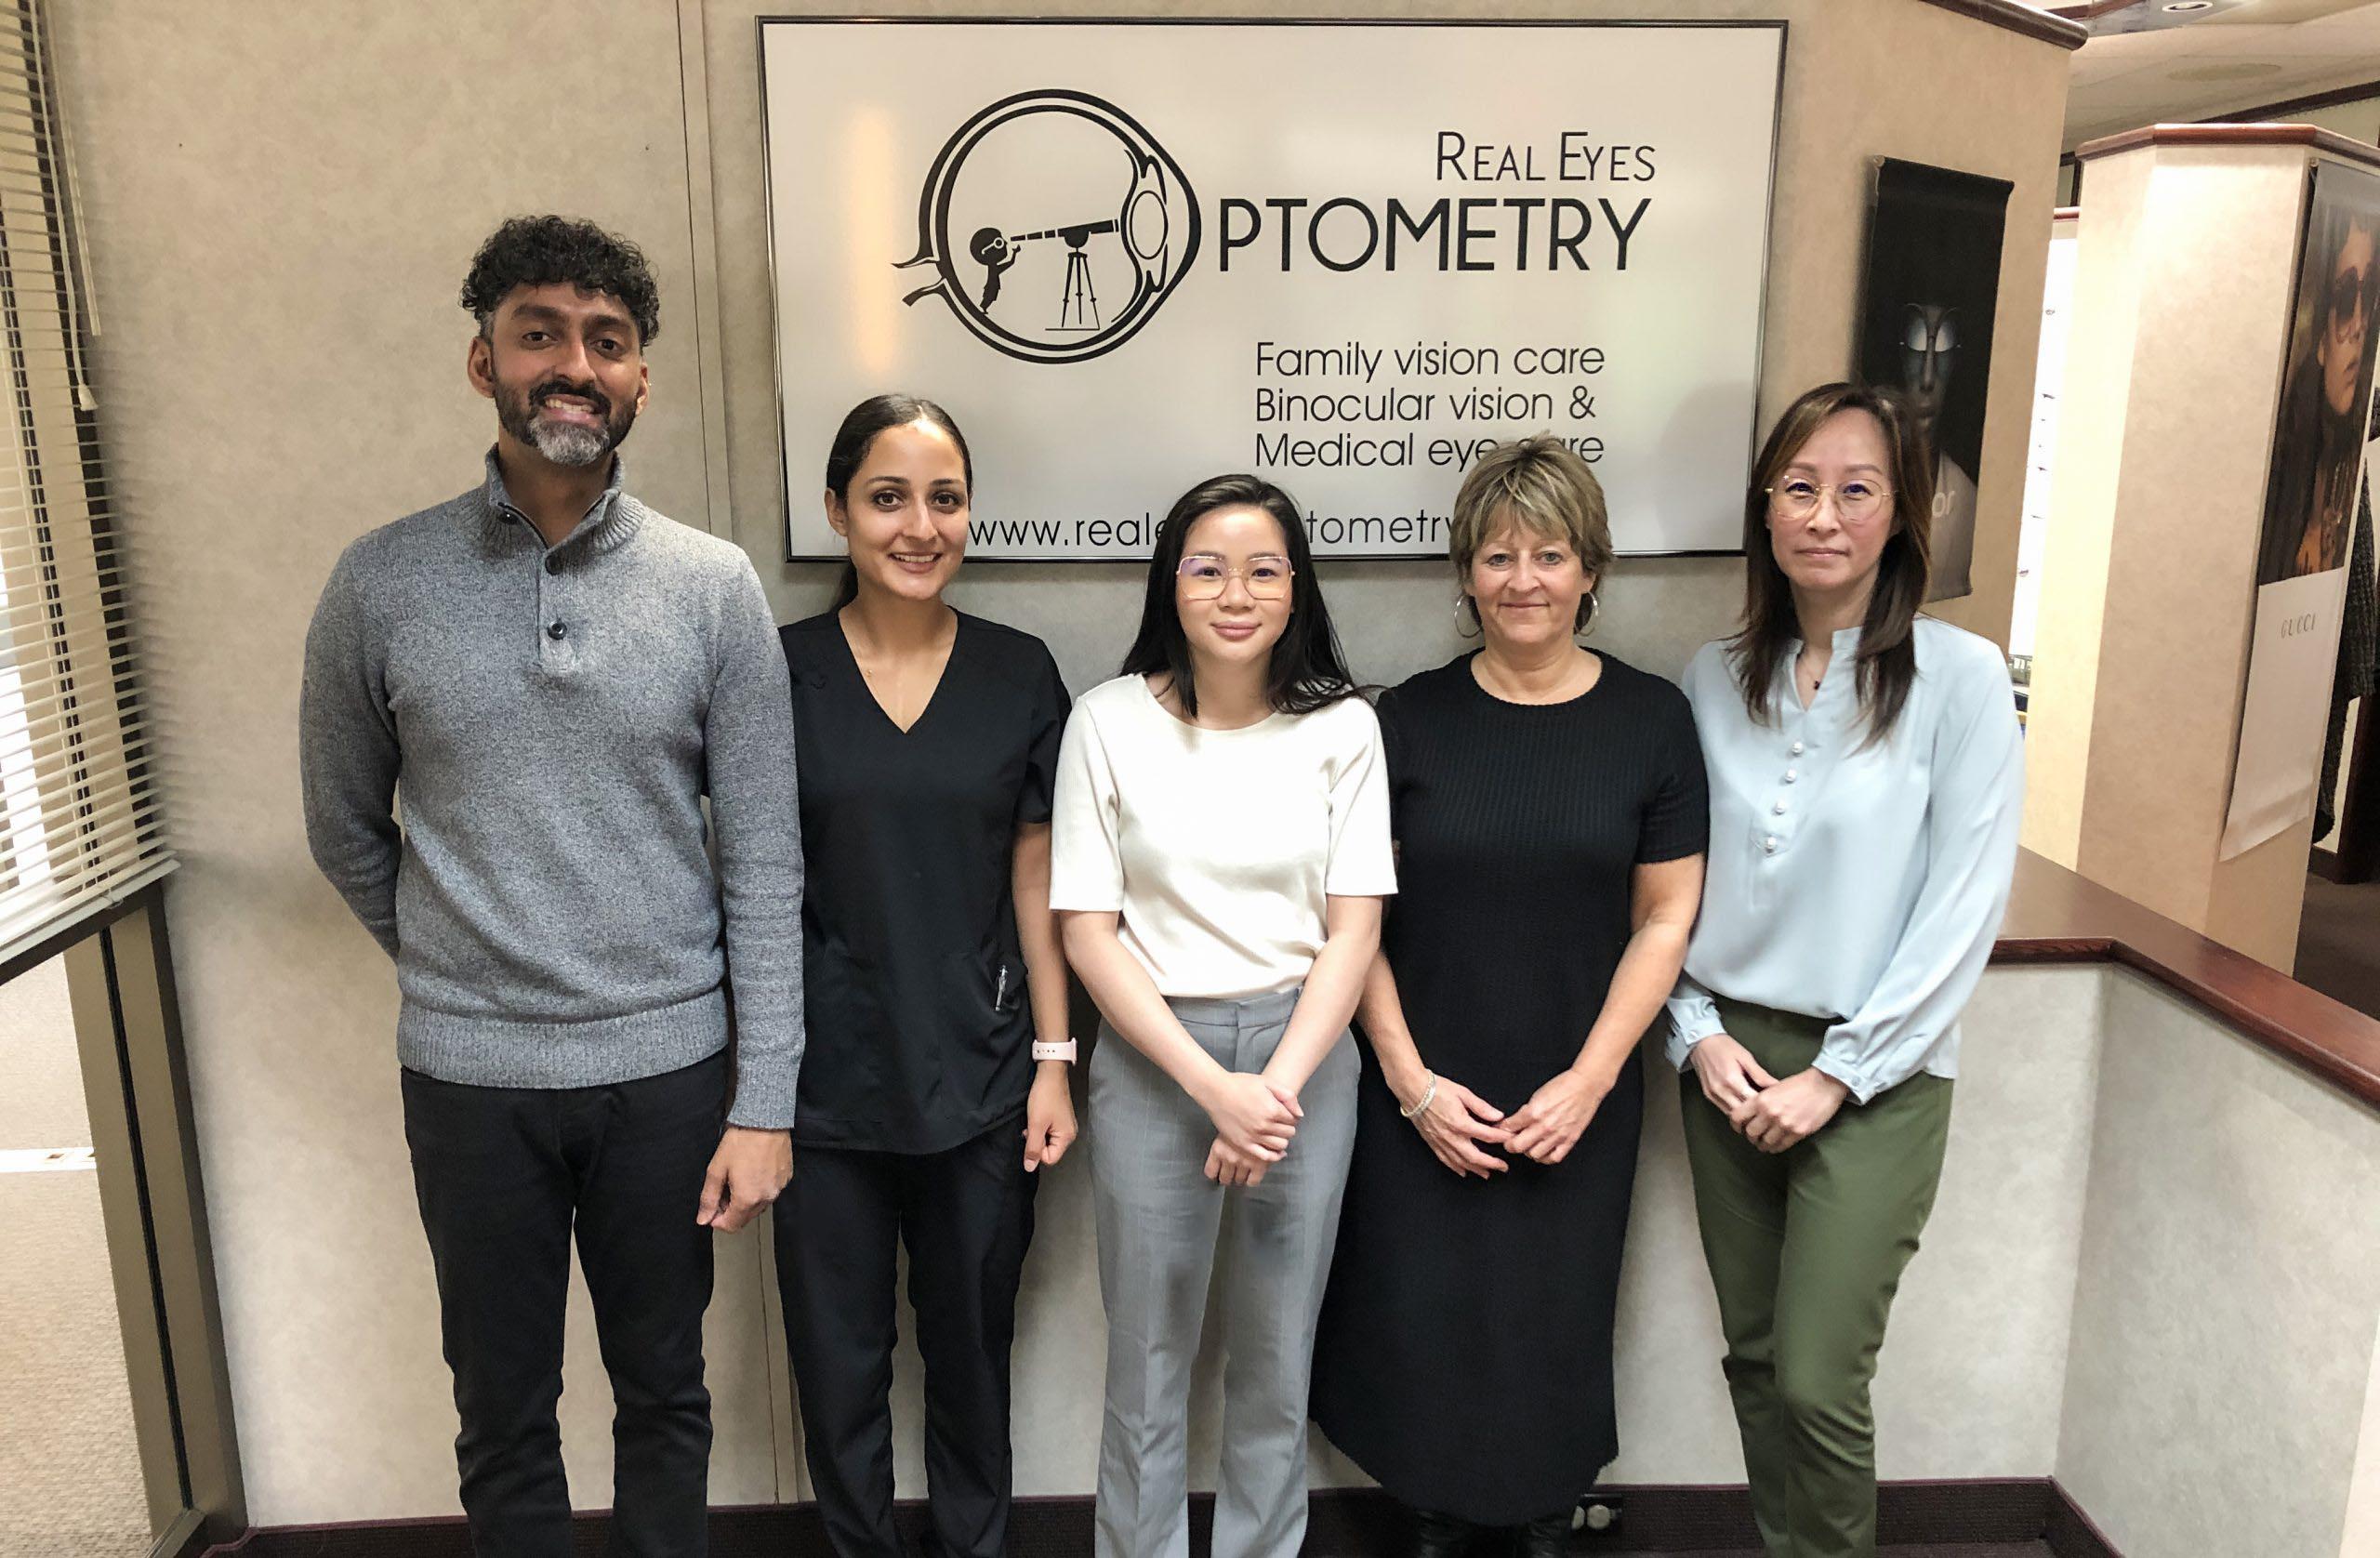 Real Eyes Optometry Staff Photo